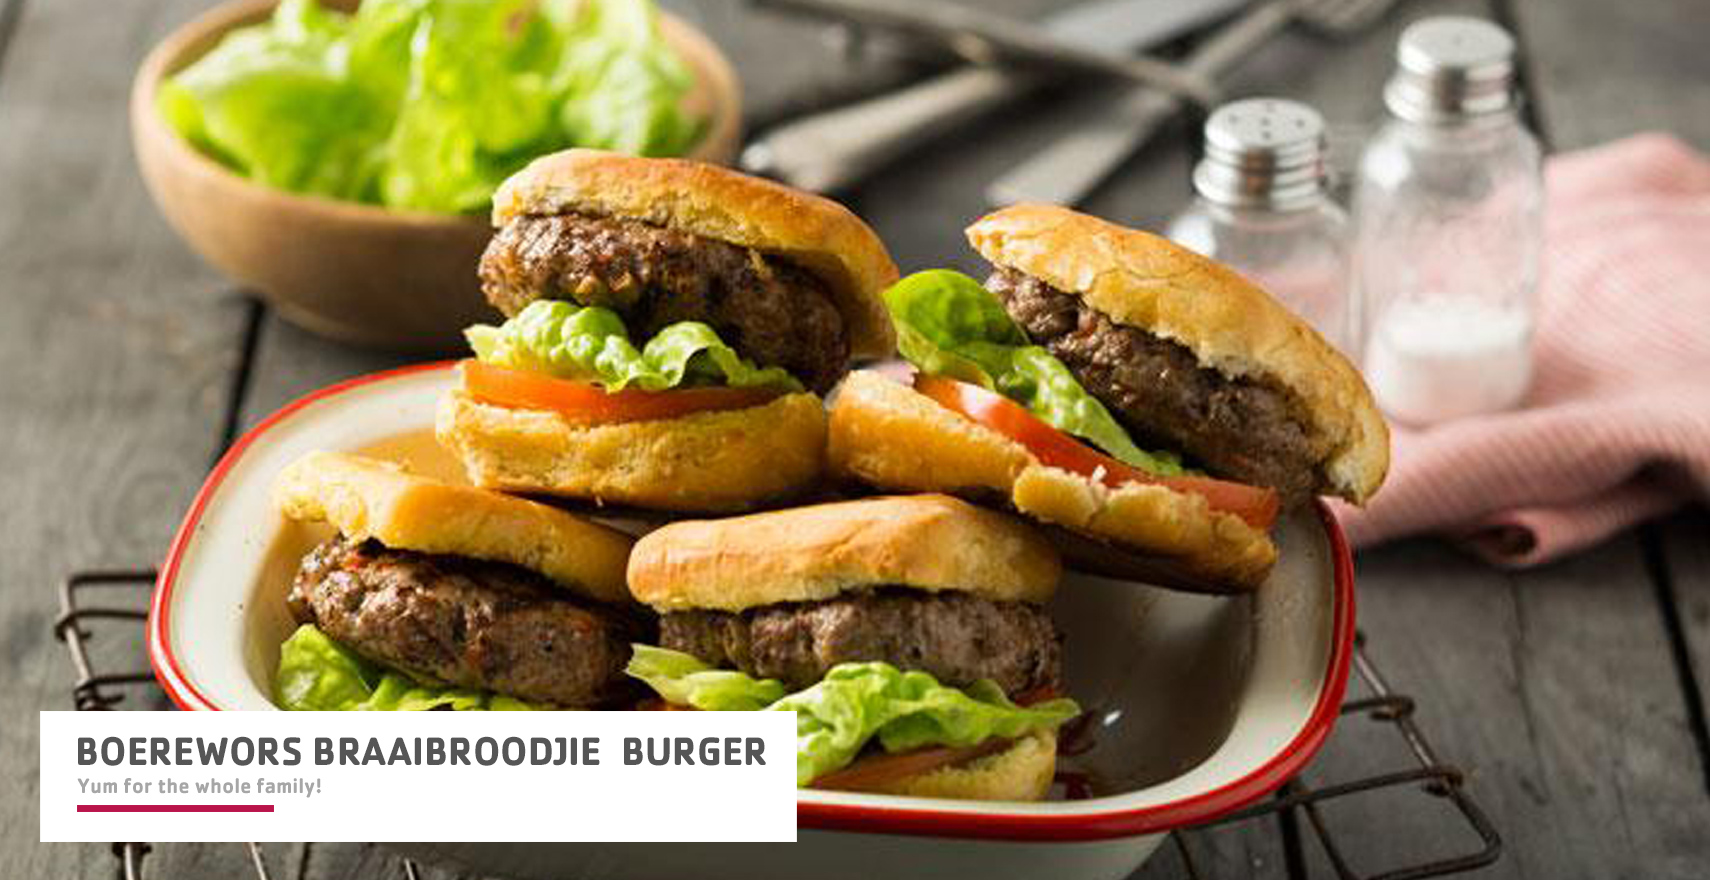 boerewors-burger-header.jpg